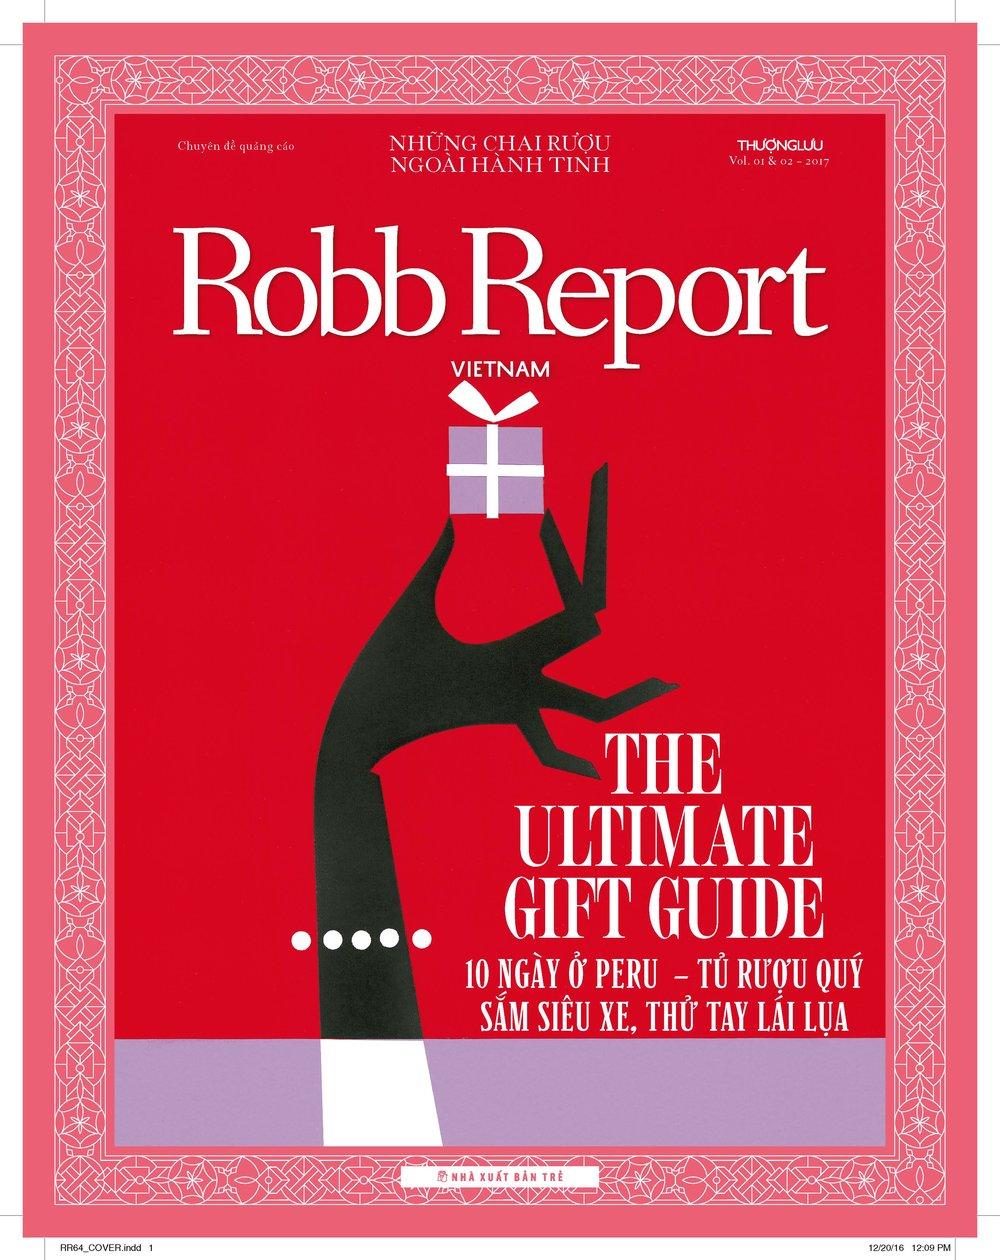 Based Upon_London_Art Design_Press_Robb Report Vietnam